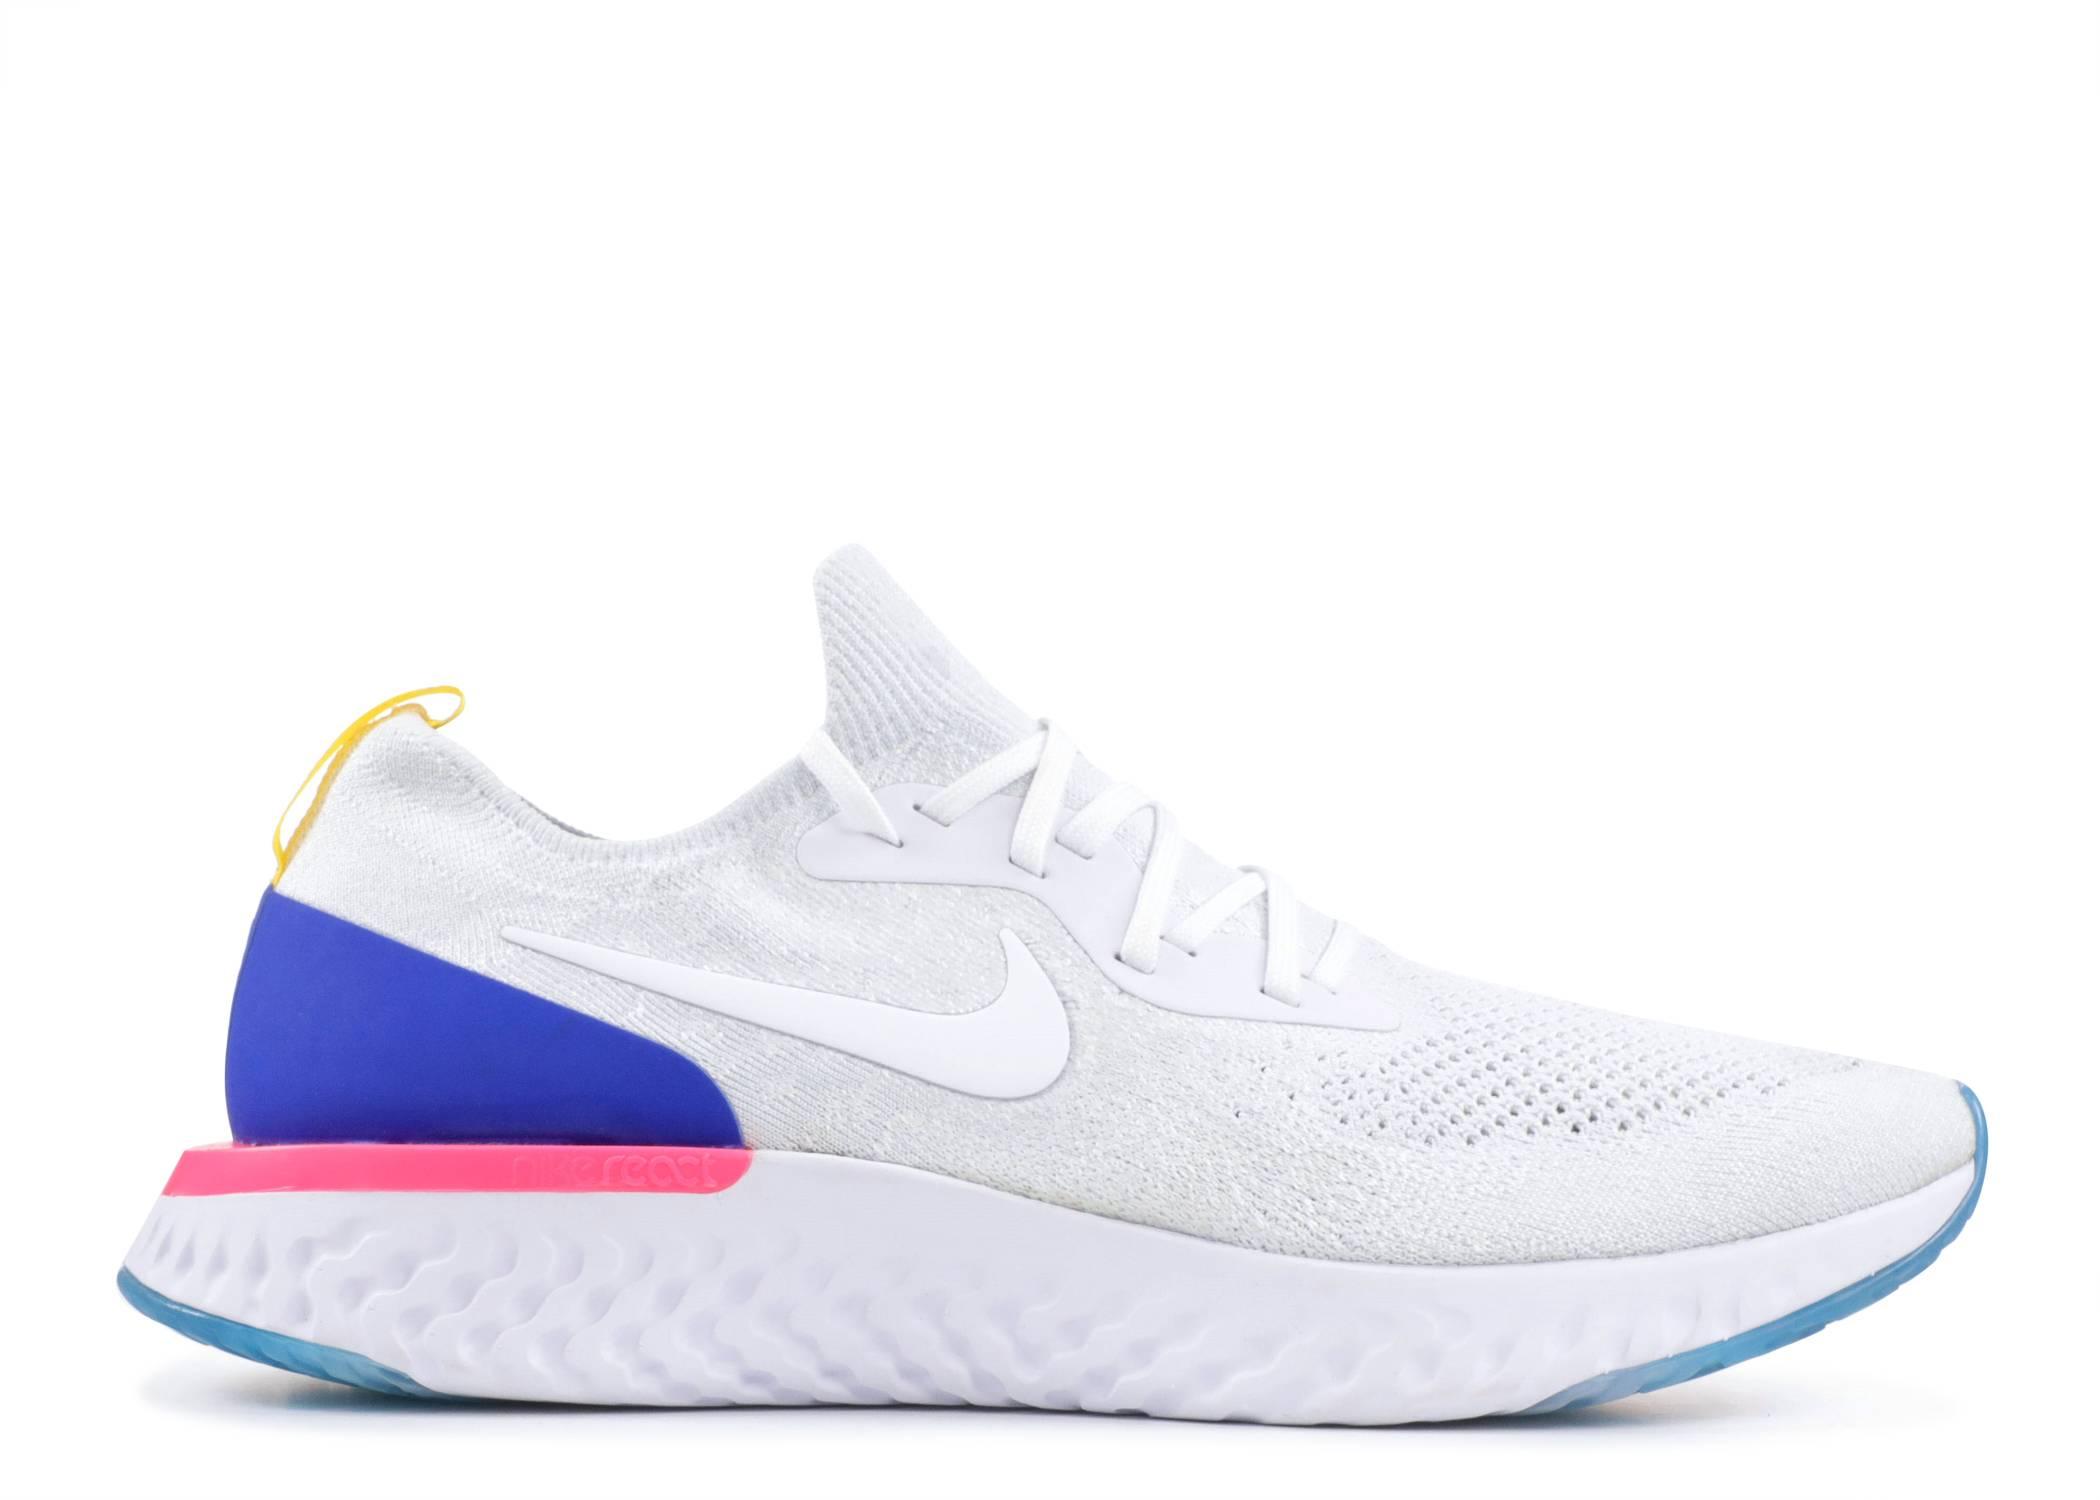 135c3da3b87b Nike Epic React Flyknit - Nike - AQ0067 101 - white white-racer blue ...